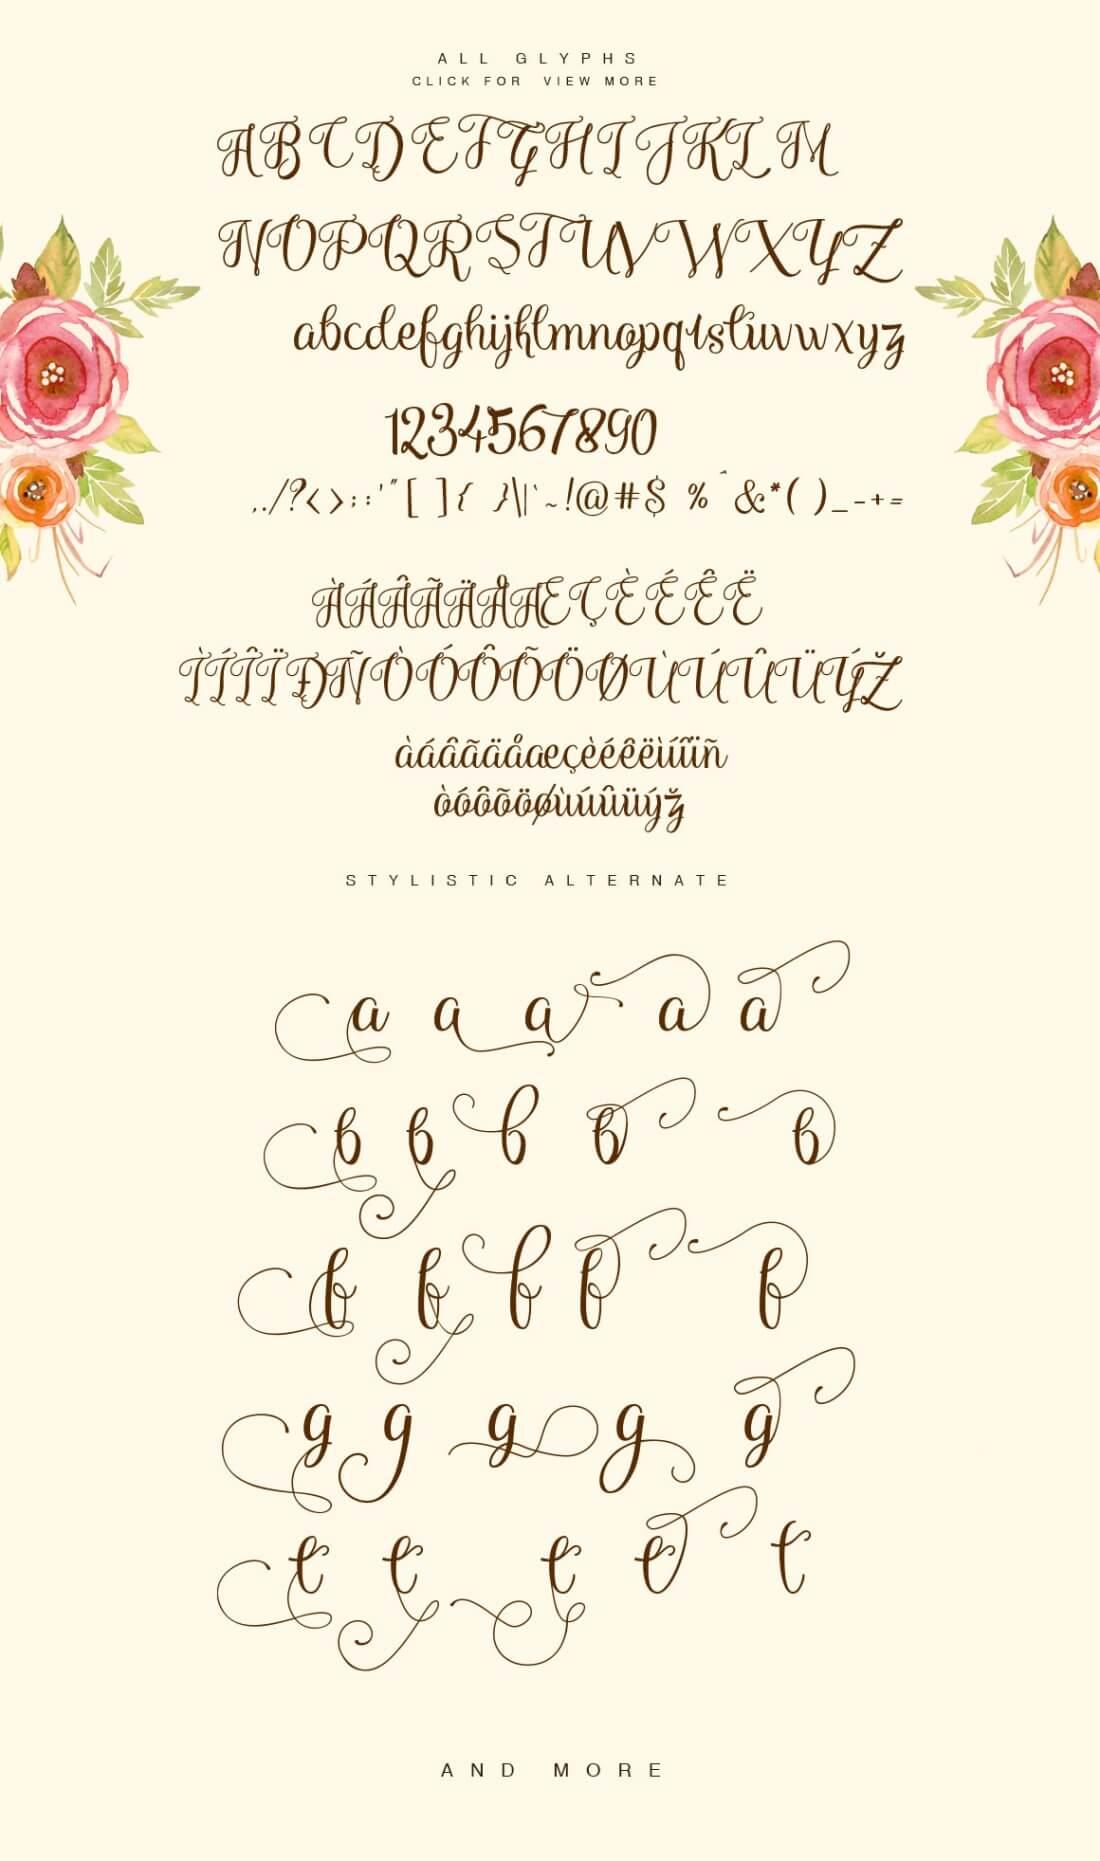 Superb Fonts Bundle Of 7 Script Display Typefaces